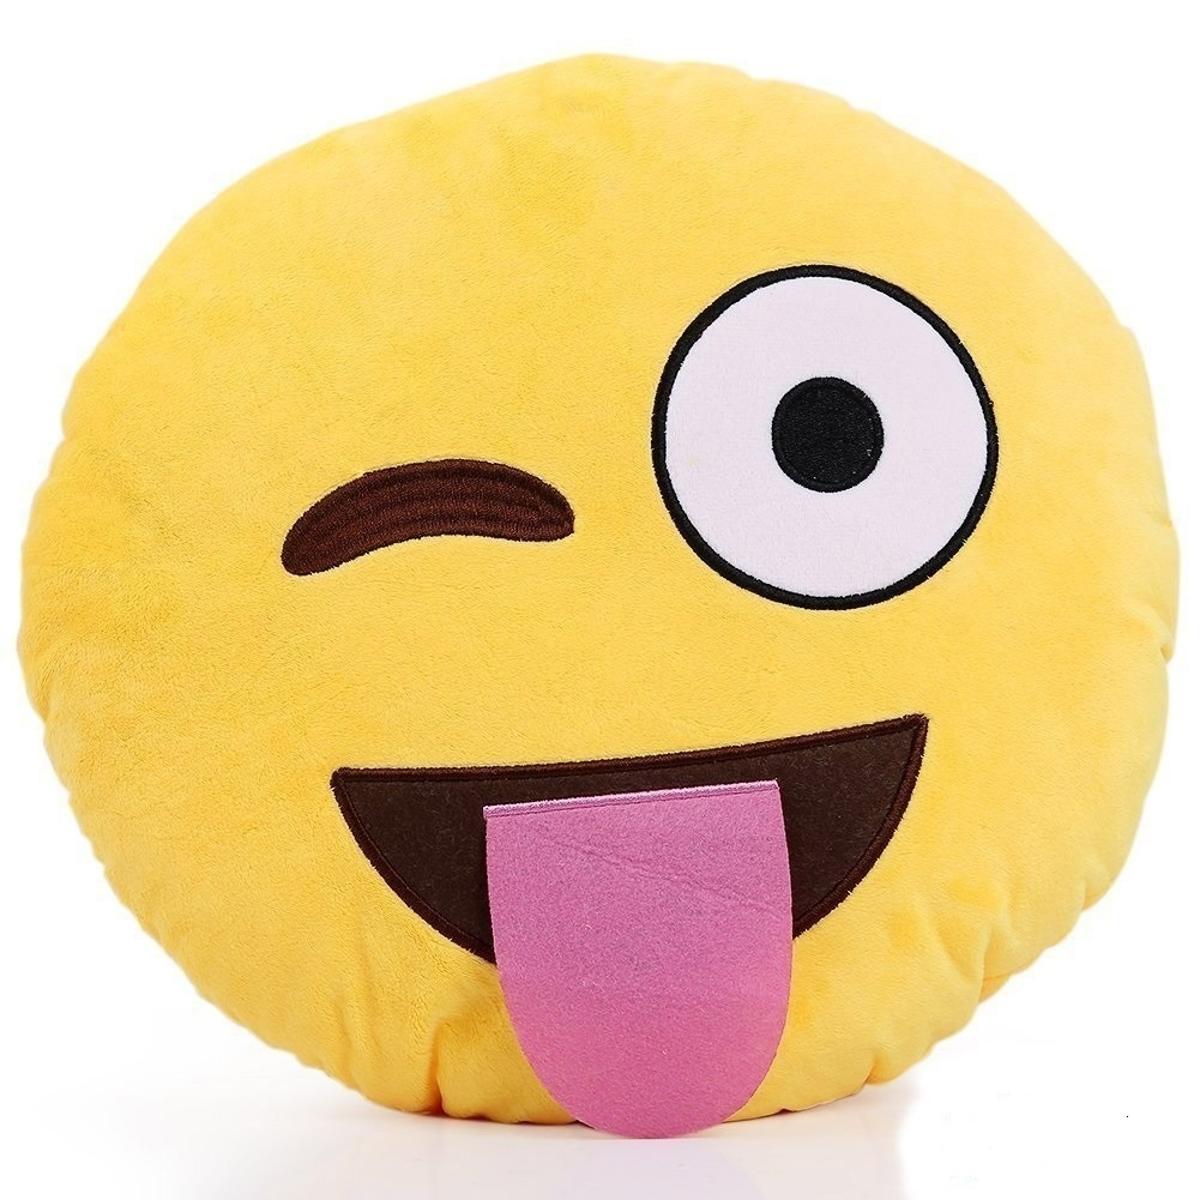 10.5 Inch Emoji Pillows